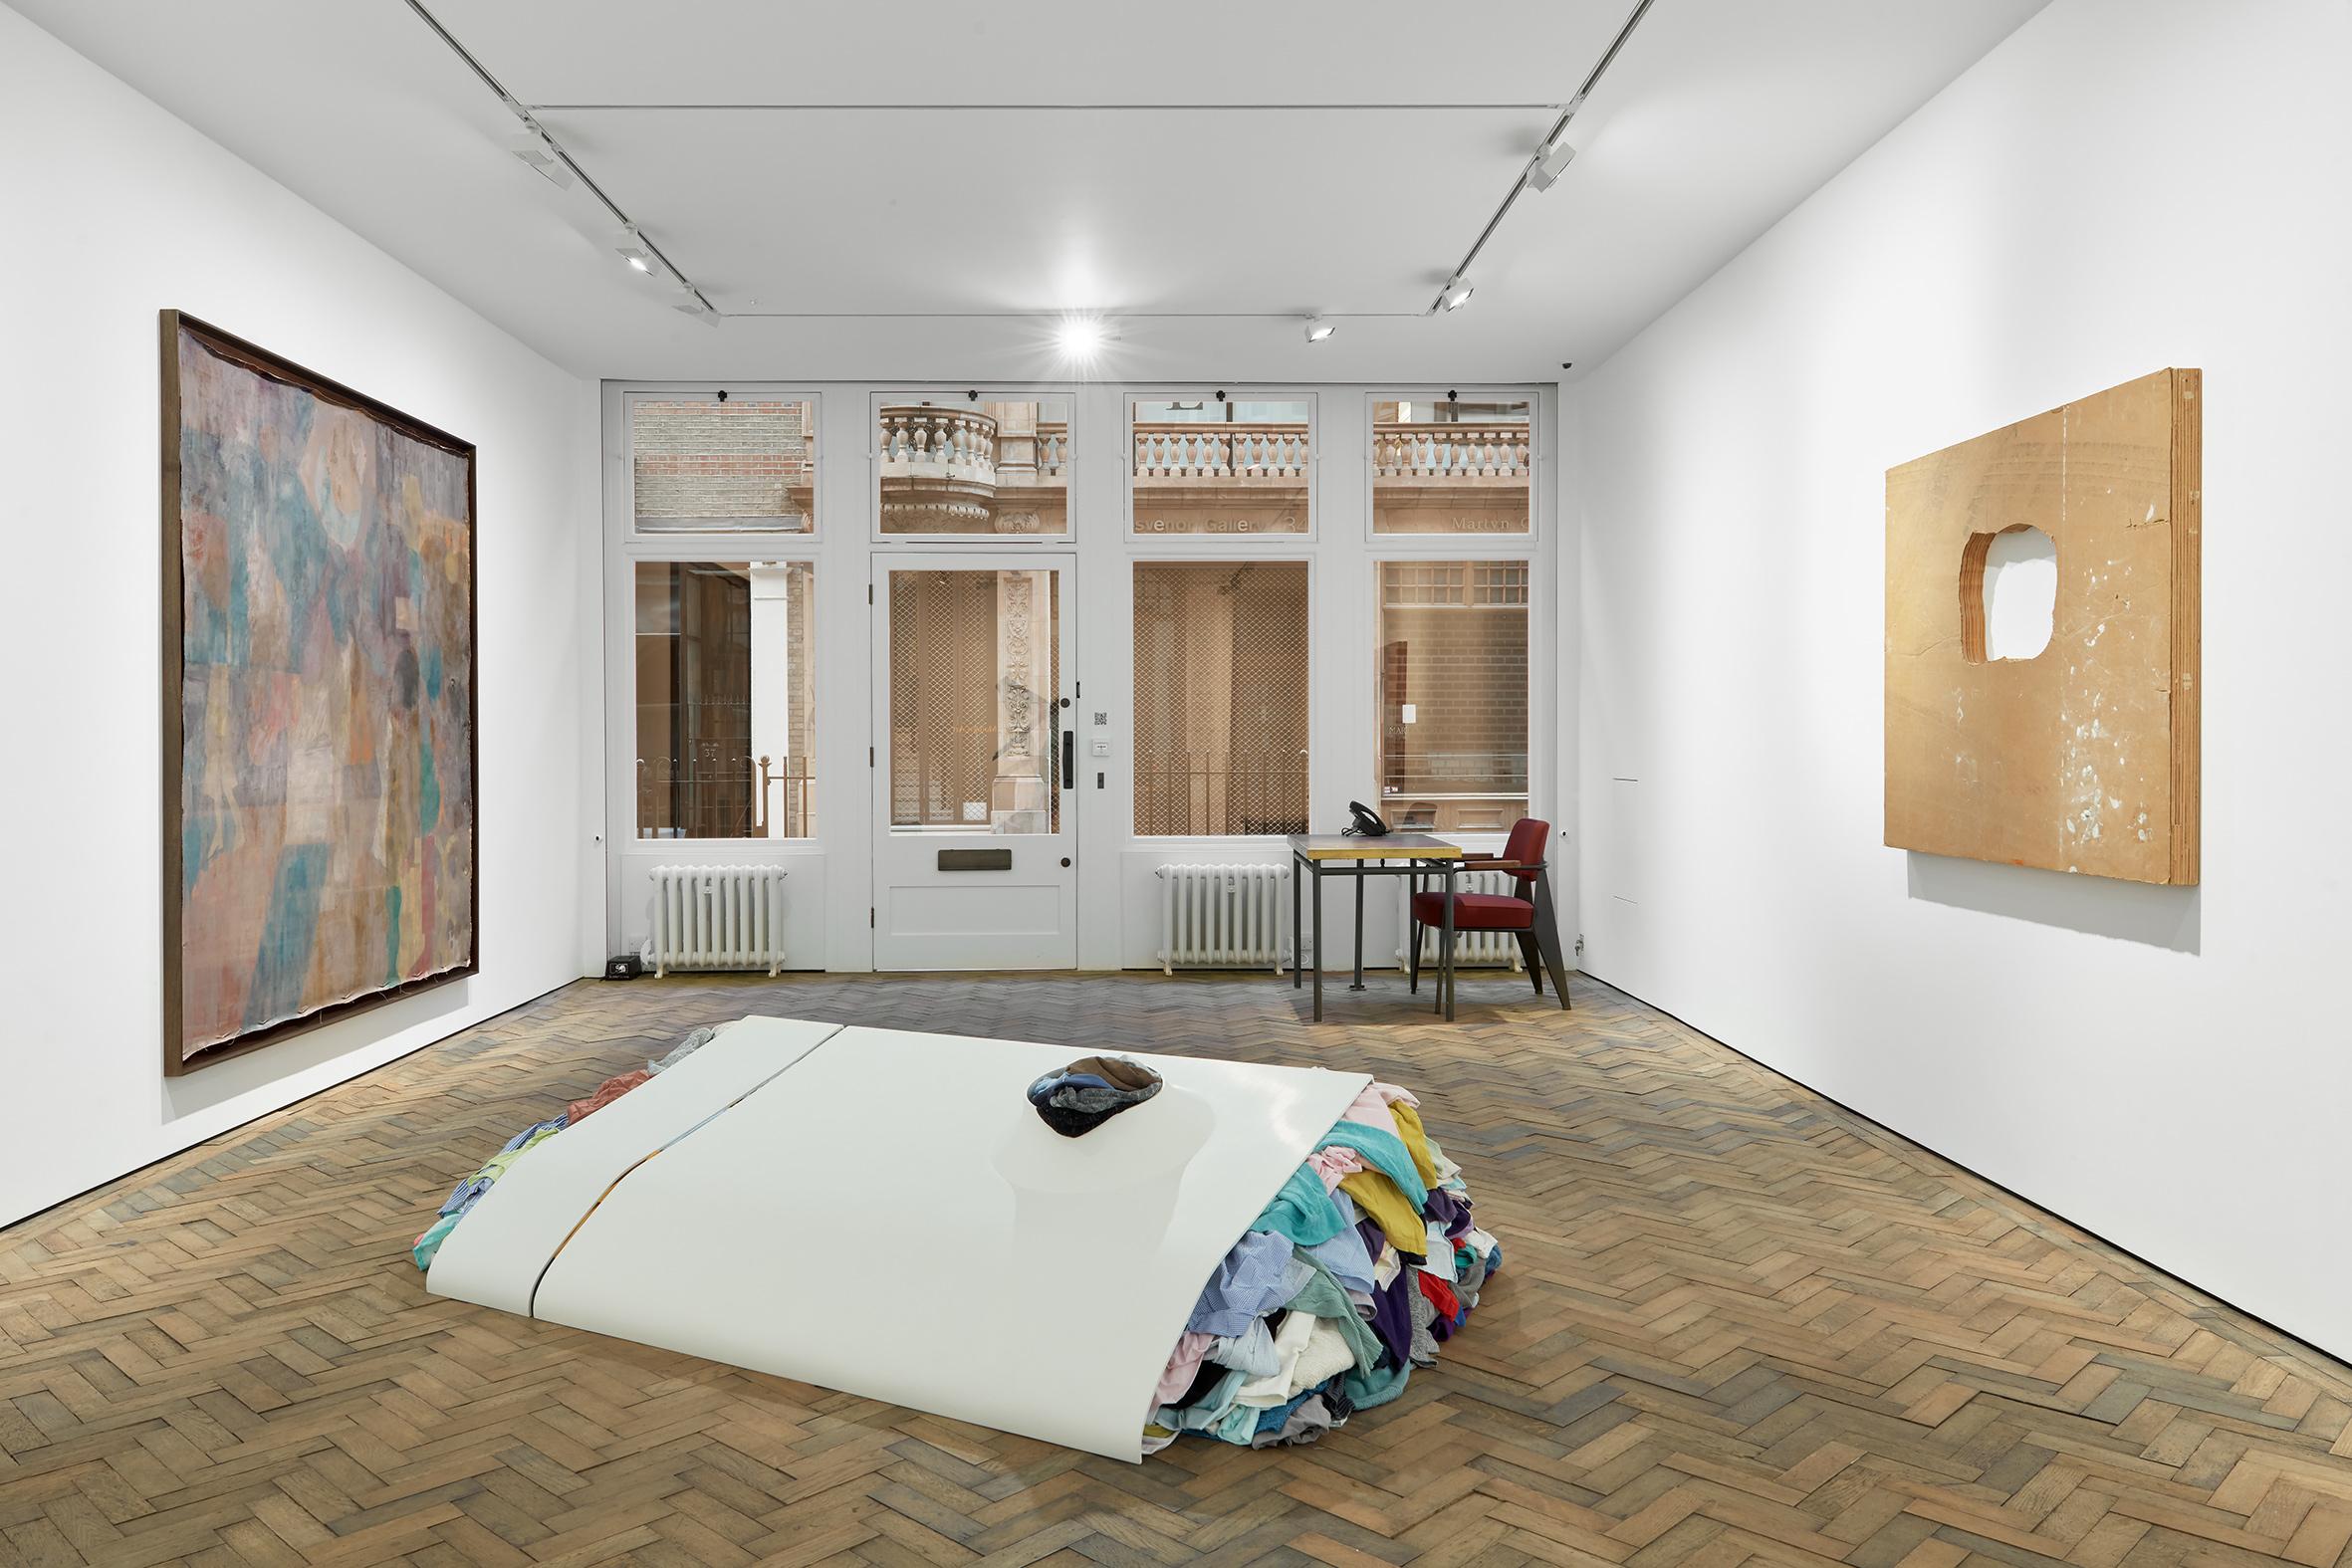 Group Show, exhibition view, Modern Art, Bury Street, London, 25 February - 17 April 2021. Photo: Robert Glowacki. Courtesy of Modern Art, London